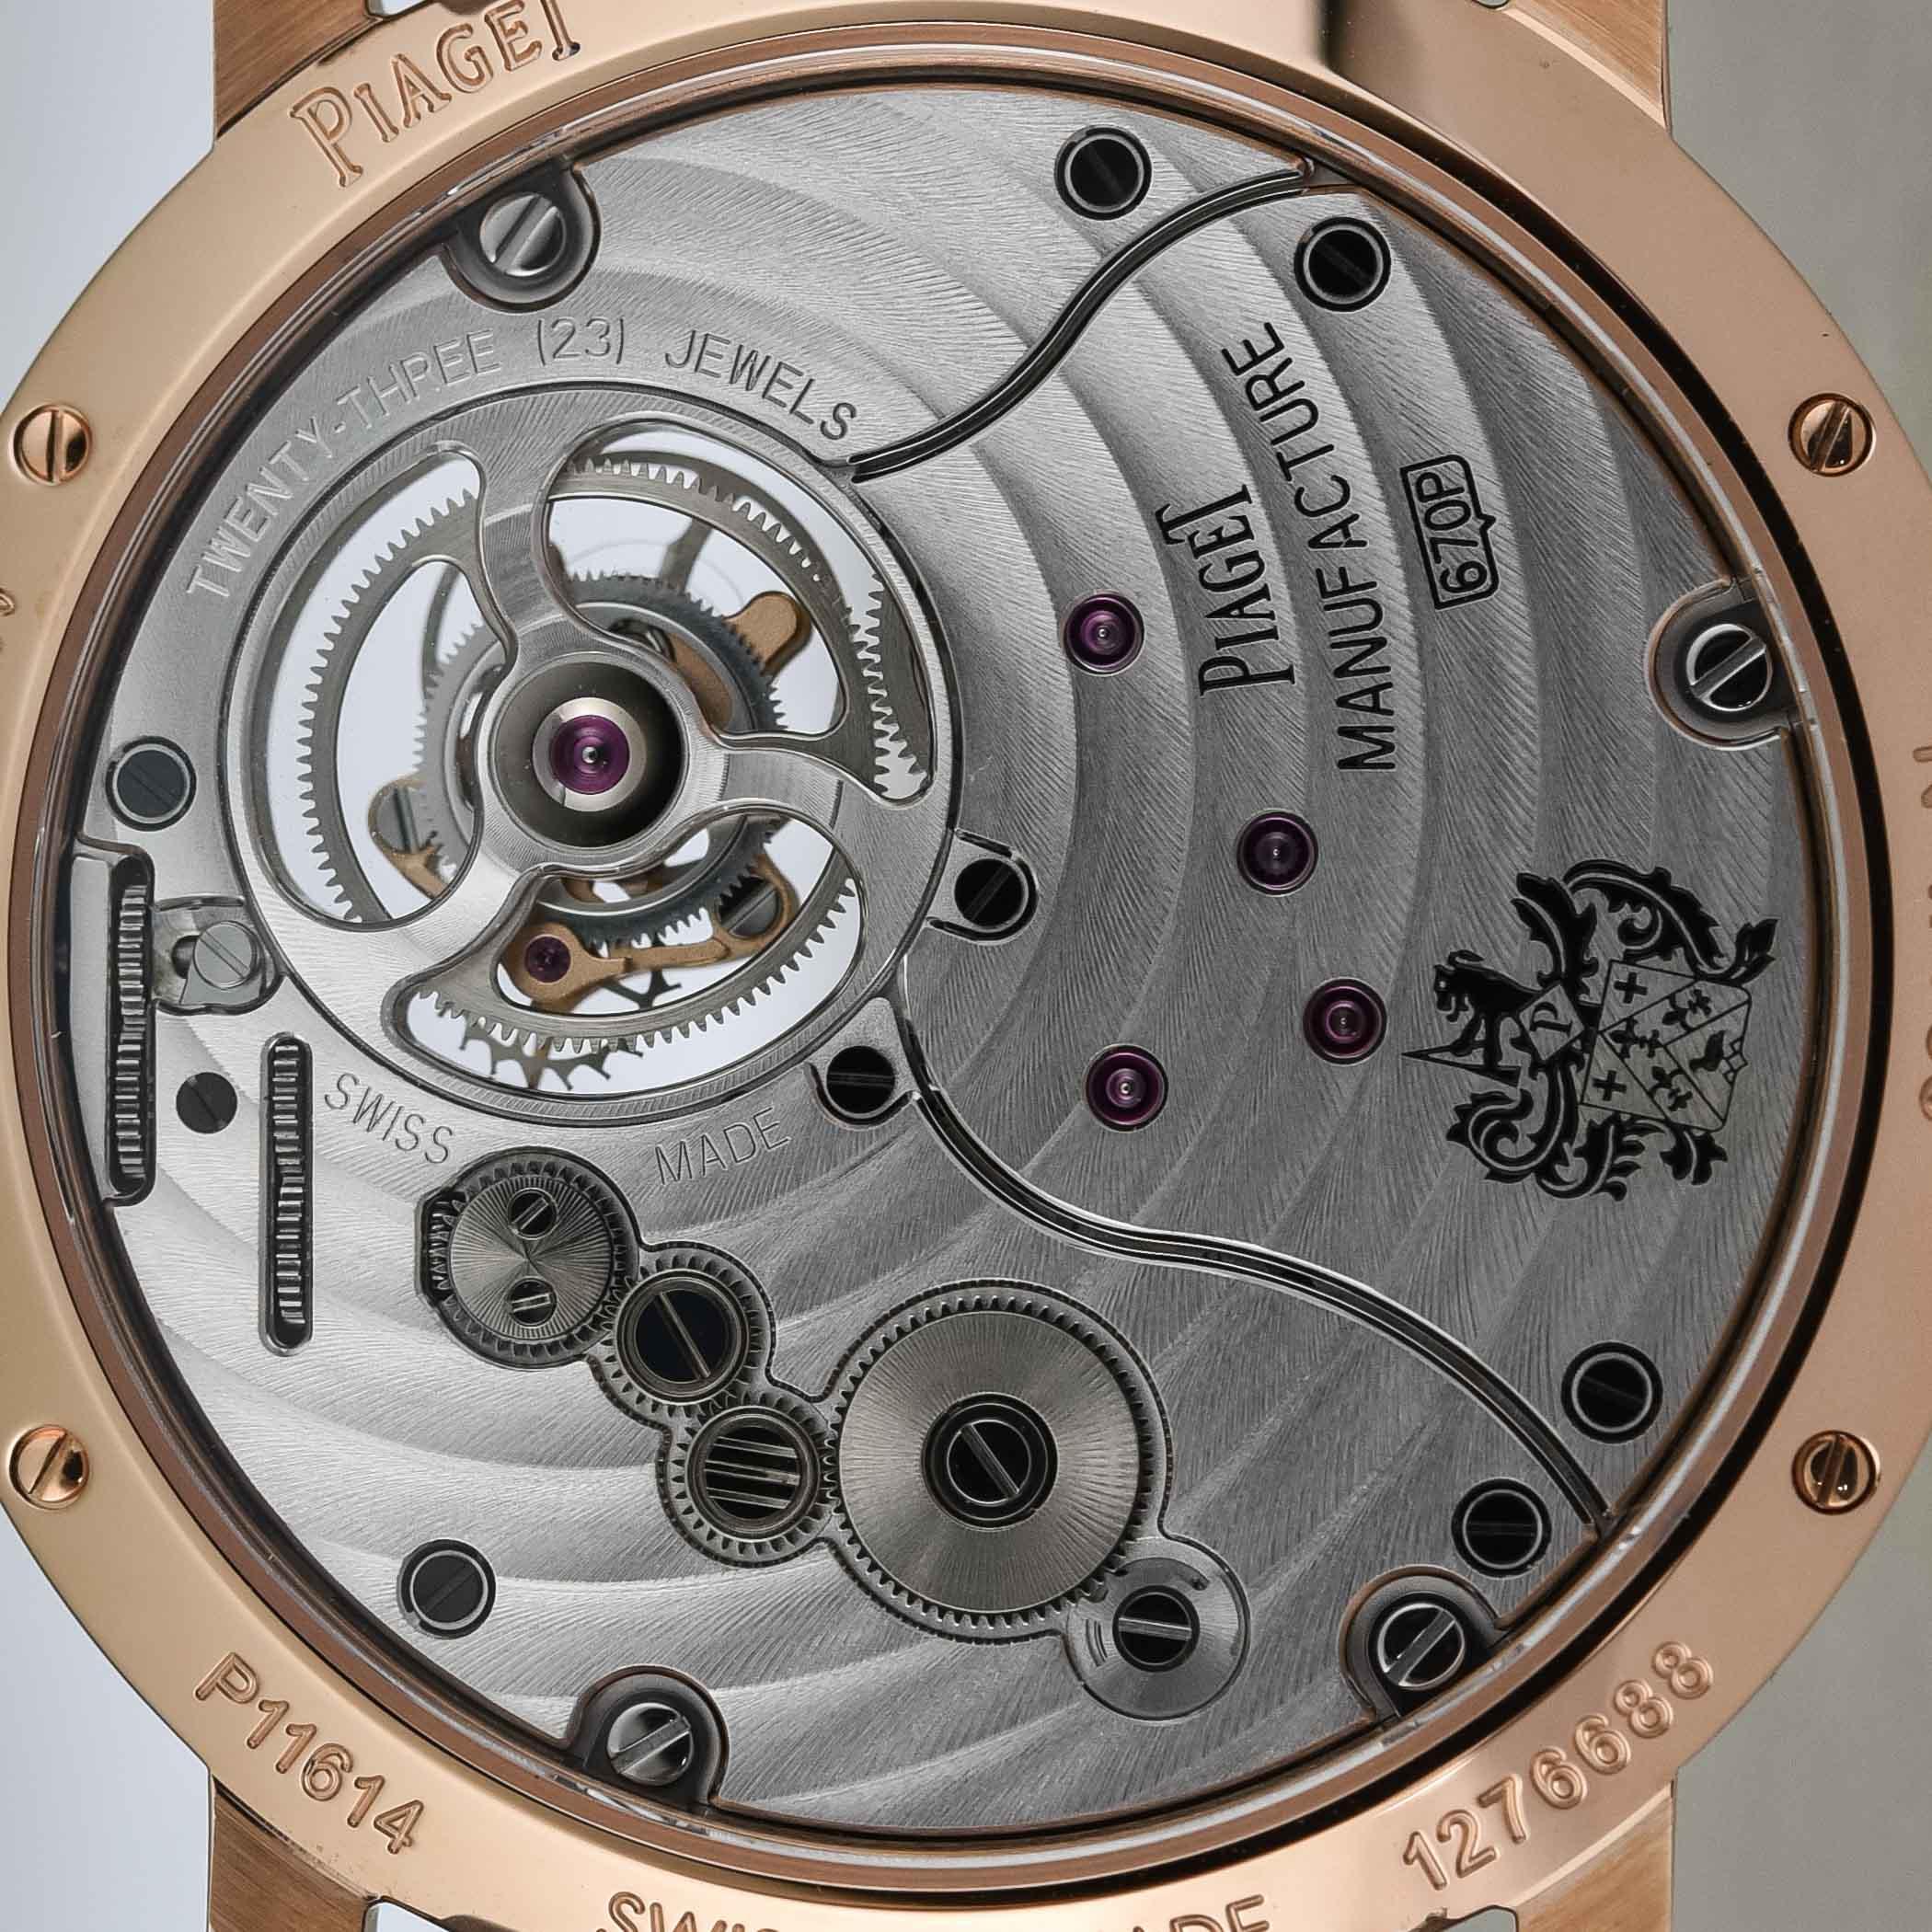 Piaget Altiplano Tourbillon 38mm Limited Edition